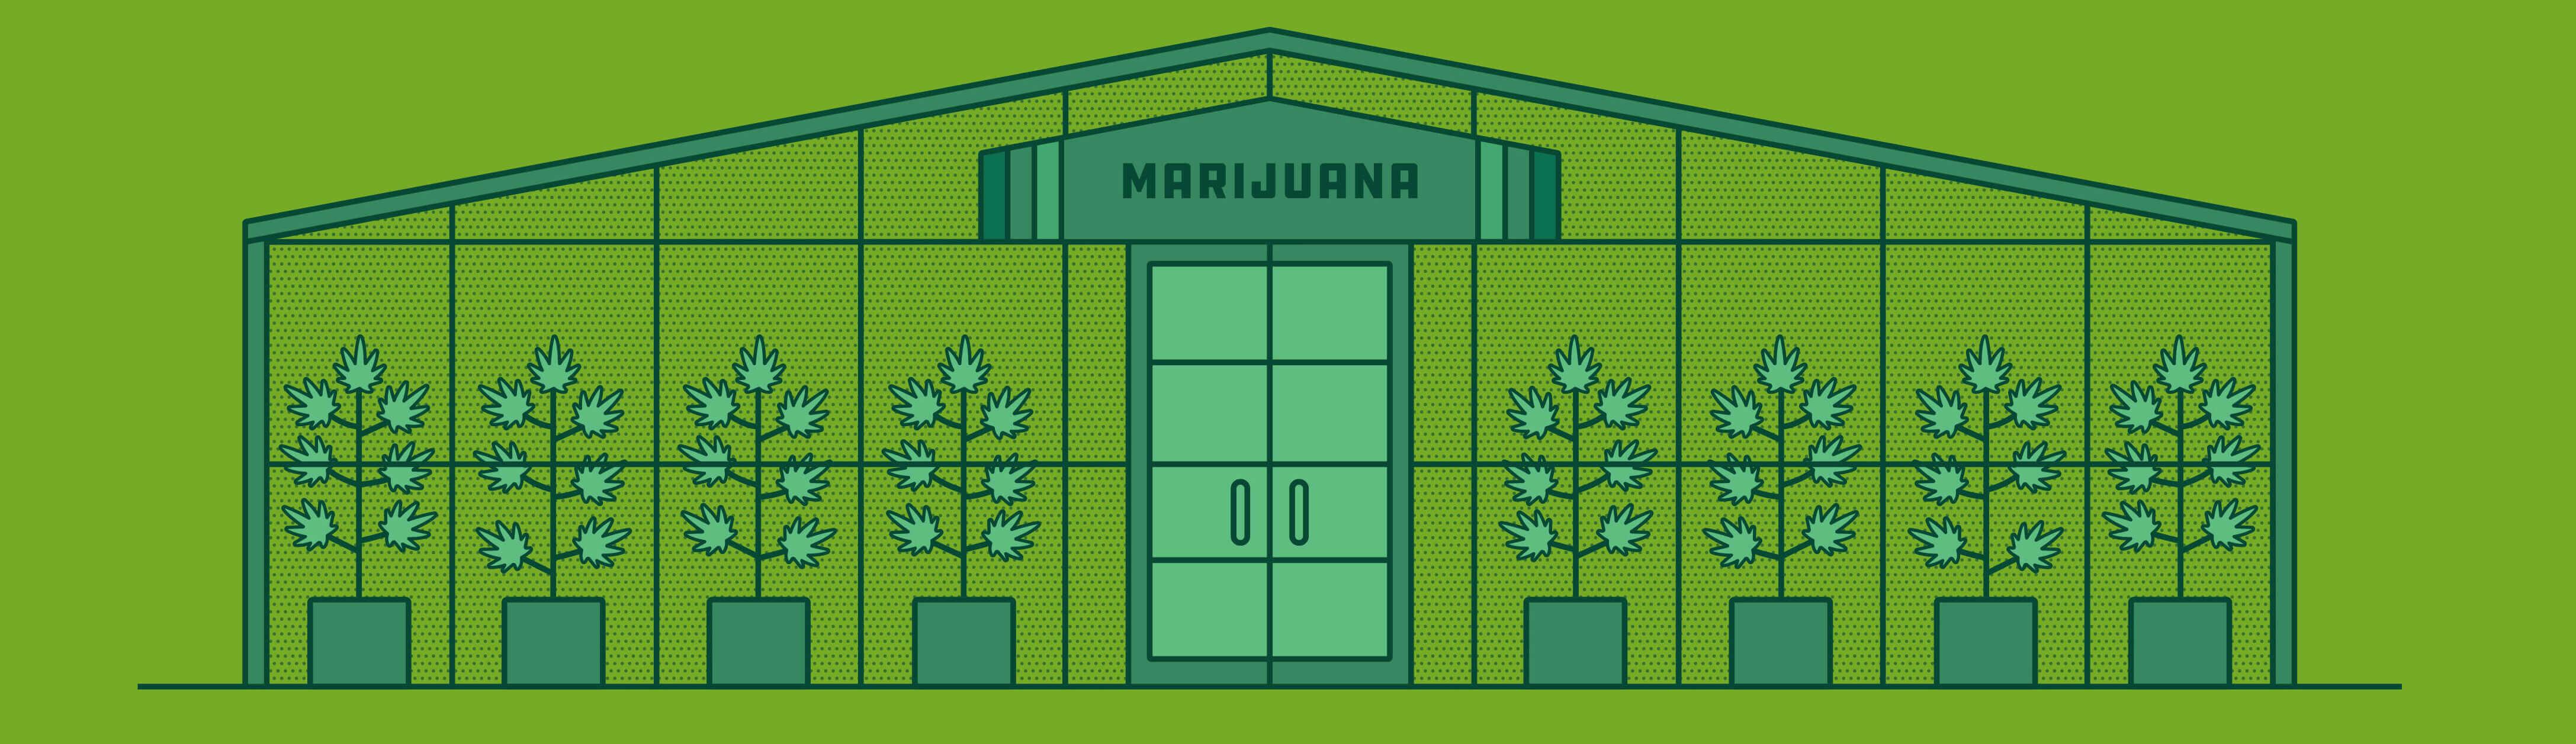 Anleitung für den Cannabis Anbau